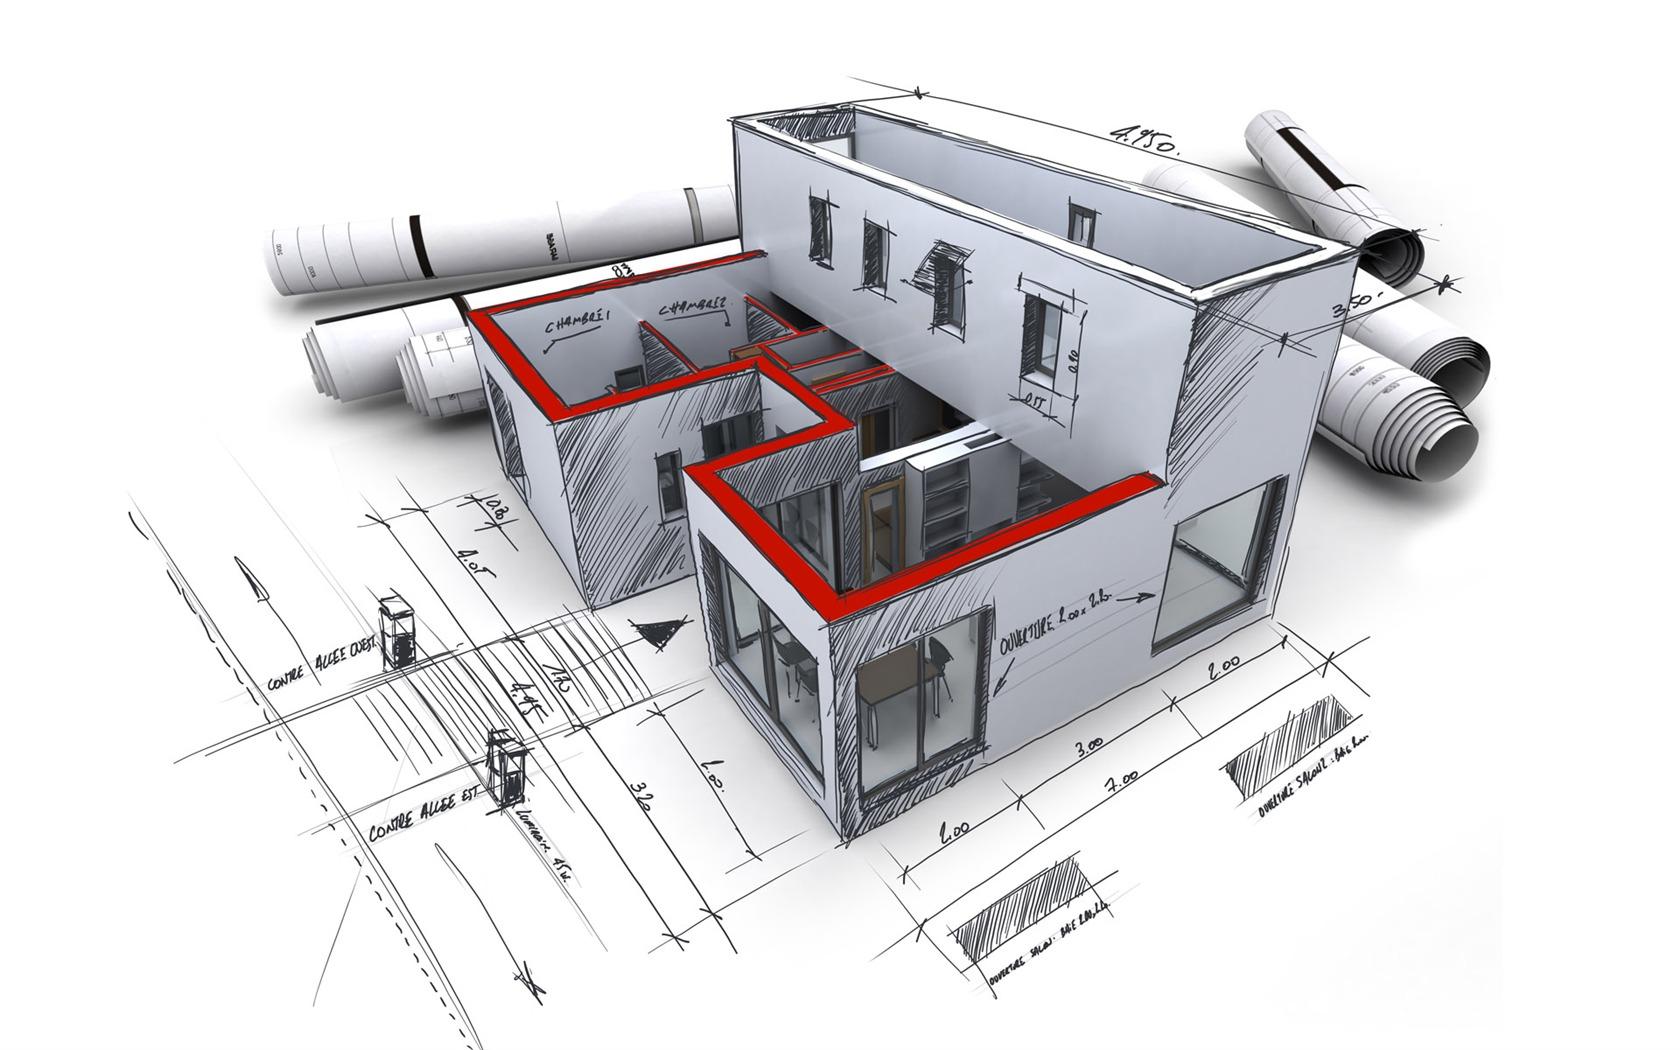 3D Architectural Design Wallpaper (1) #19 - 1680x1050.